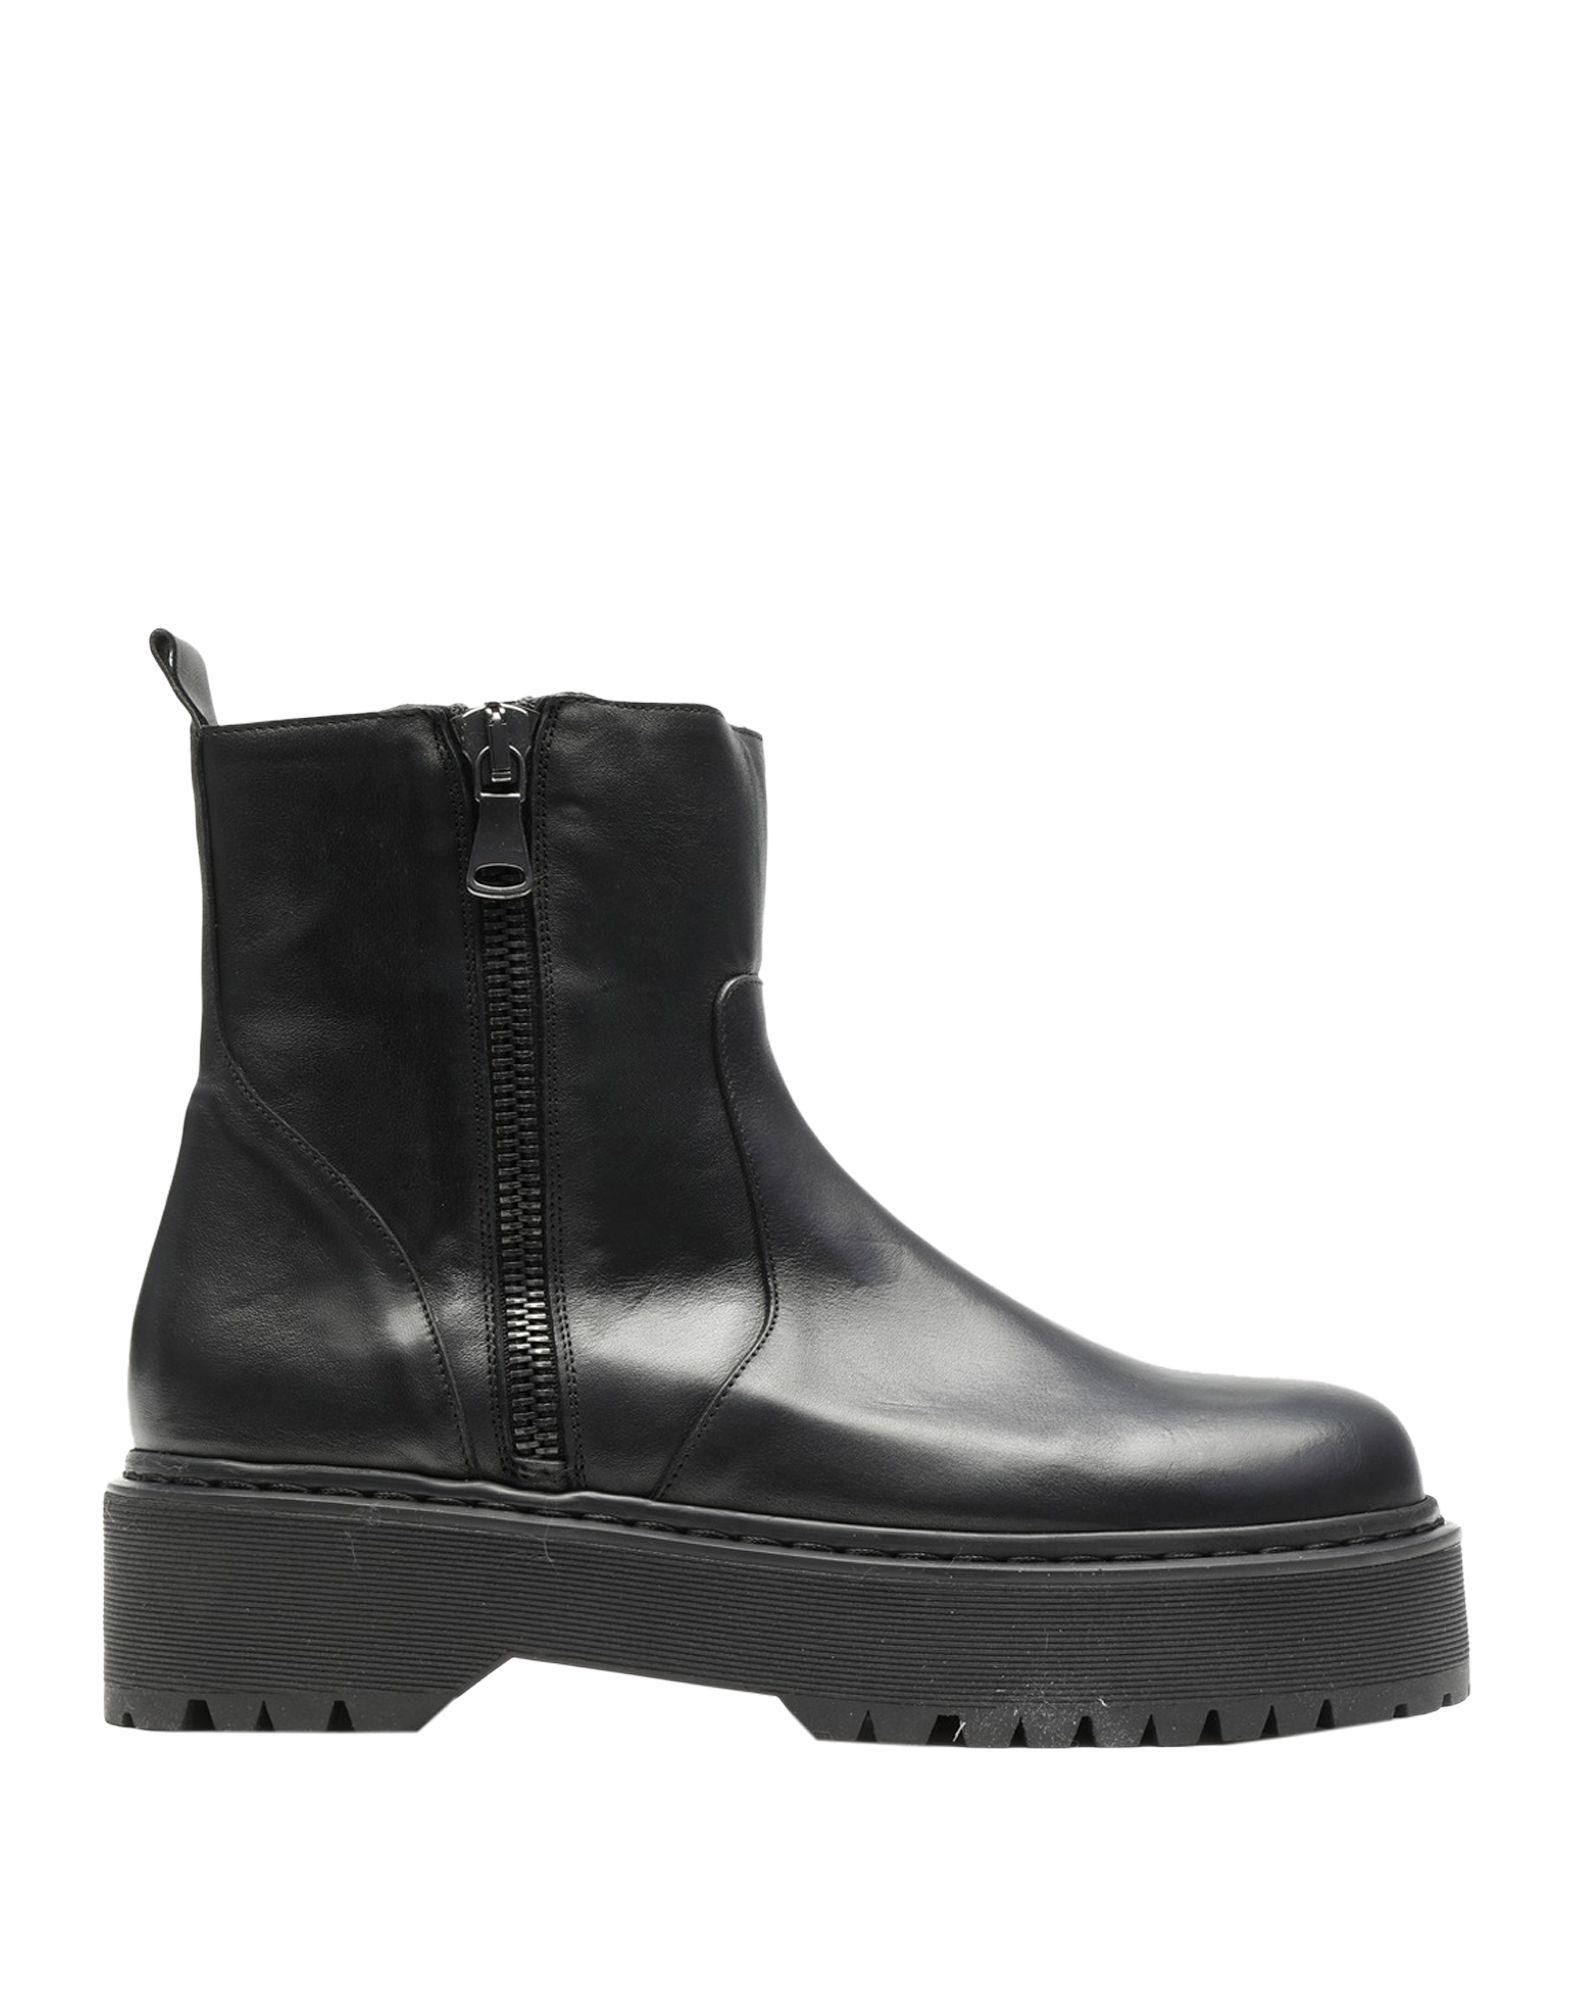 Pierre  Darré Stiefelette Damen  Pierre 11524369SA Gute Qualität beliebte Schuhe 7a0af8